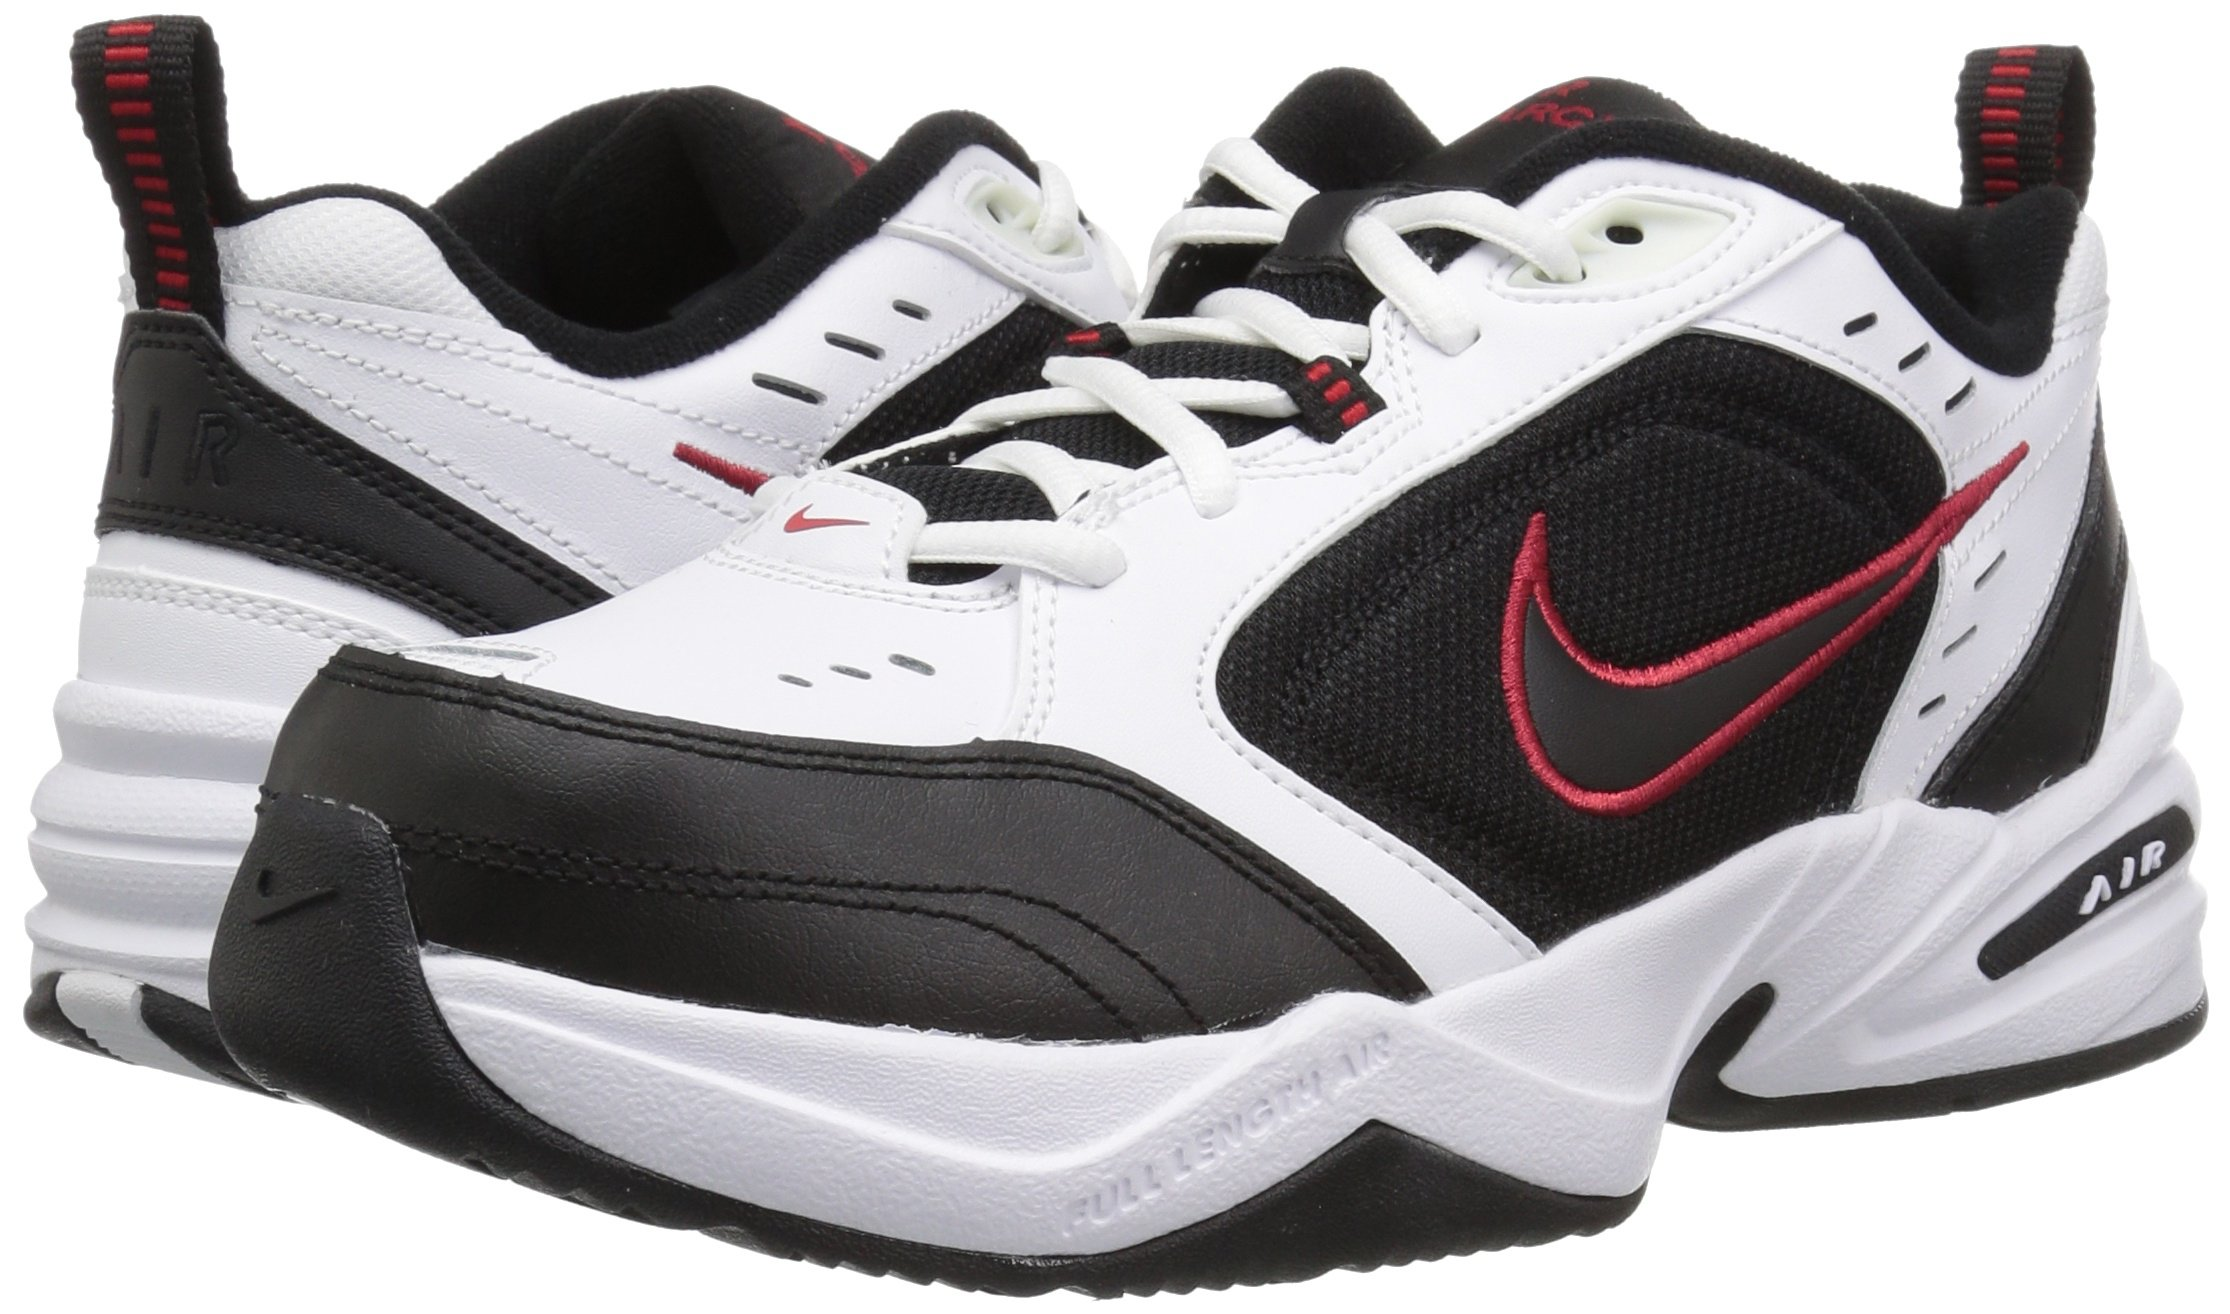 Nike-Men-039-s-Air-Monarch-IV-Cross-Trainer-Sneaker-416355 thumbnail 16